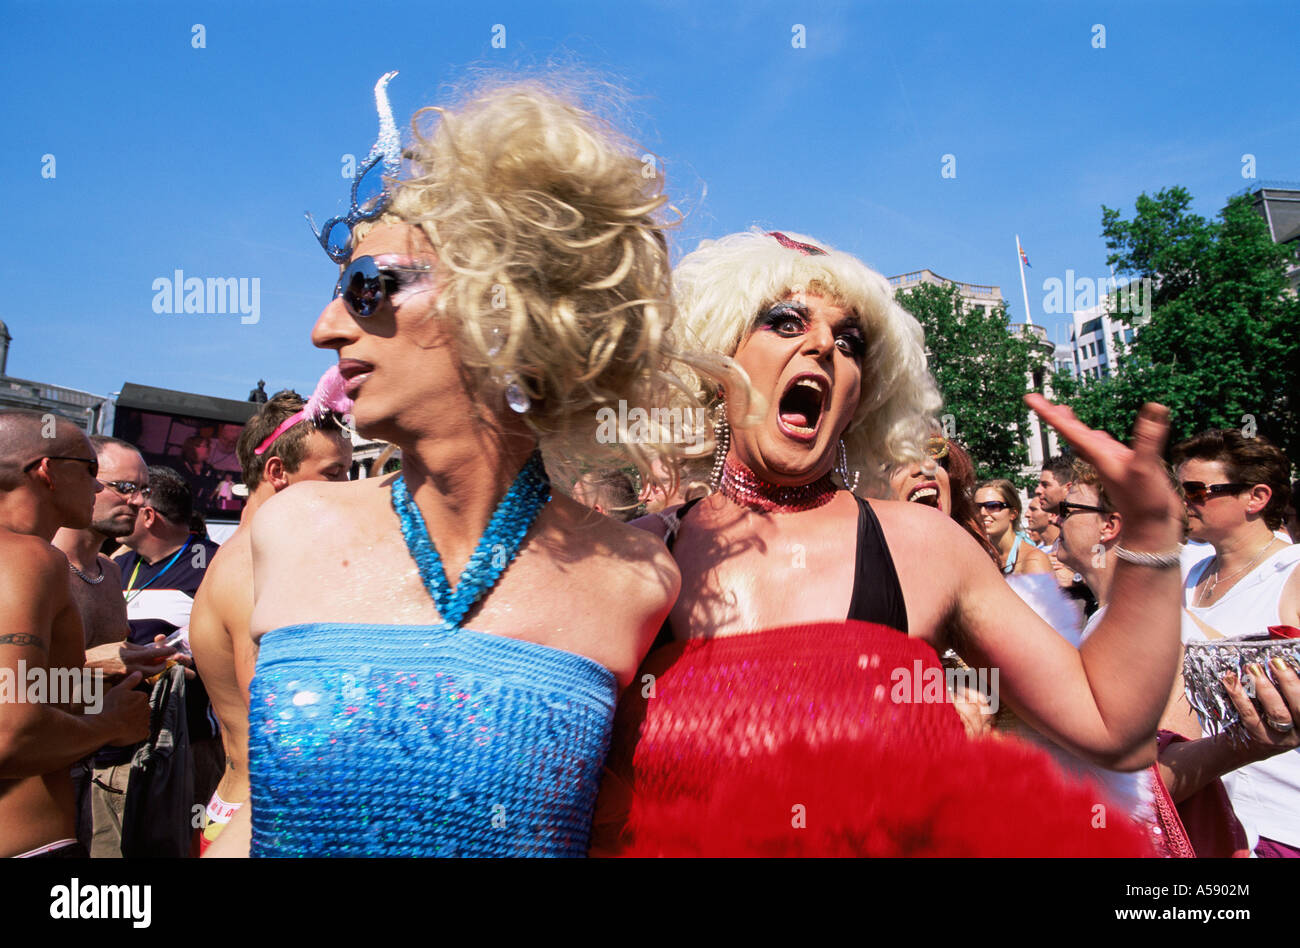 England, London, Gay Pride Festival, Drag Queens in Trafalgar Square - Stock Image